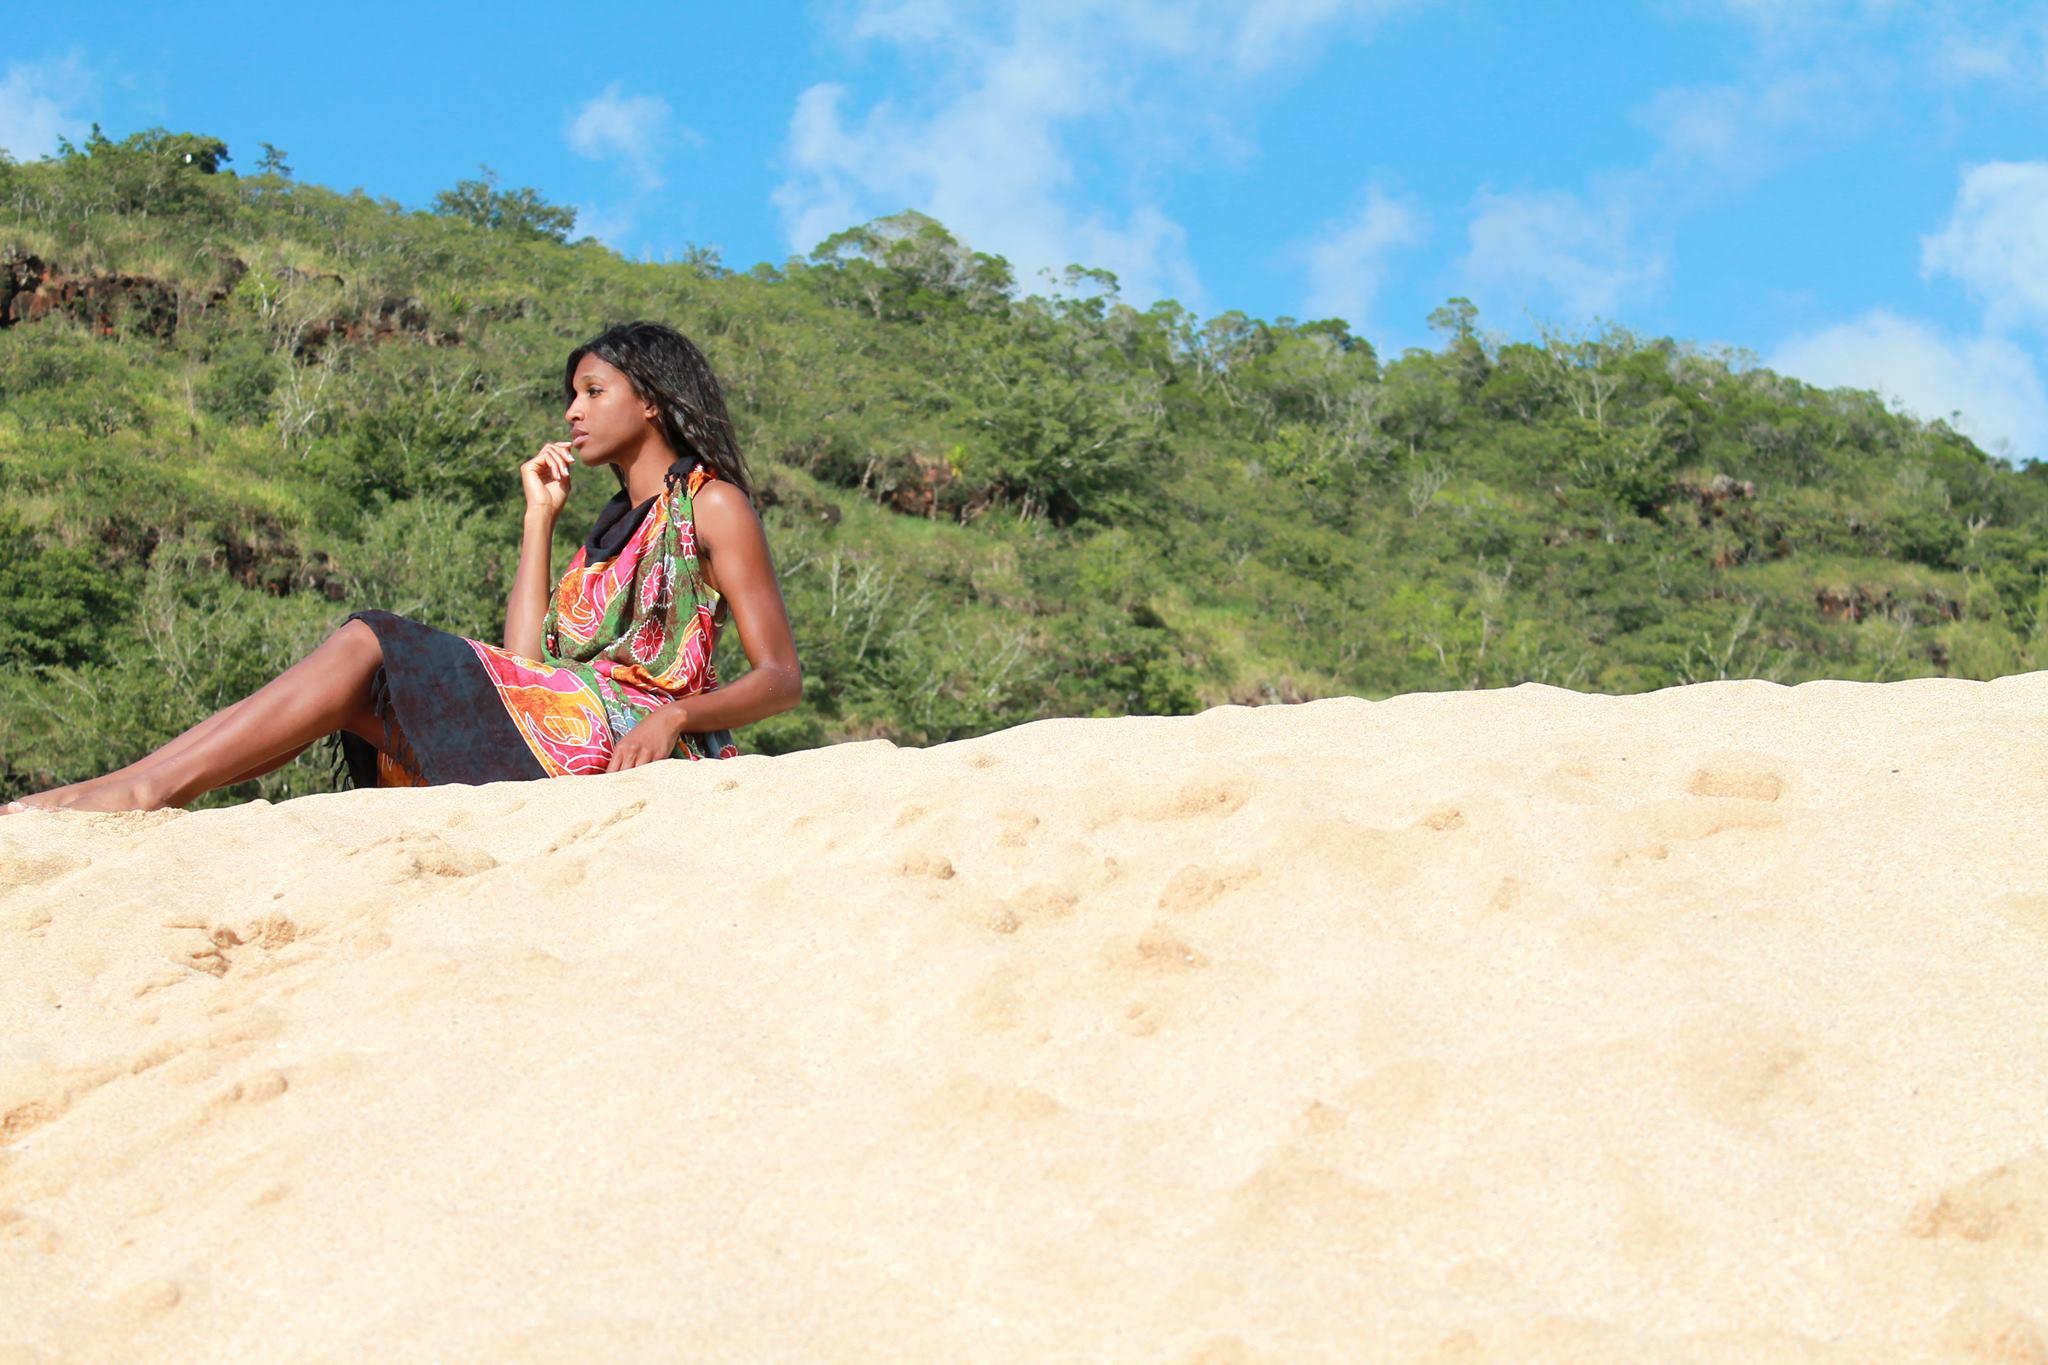 Island Editorial